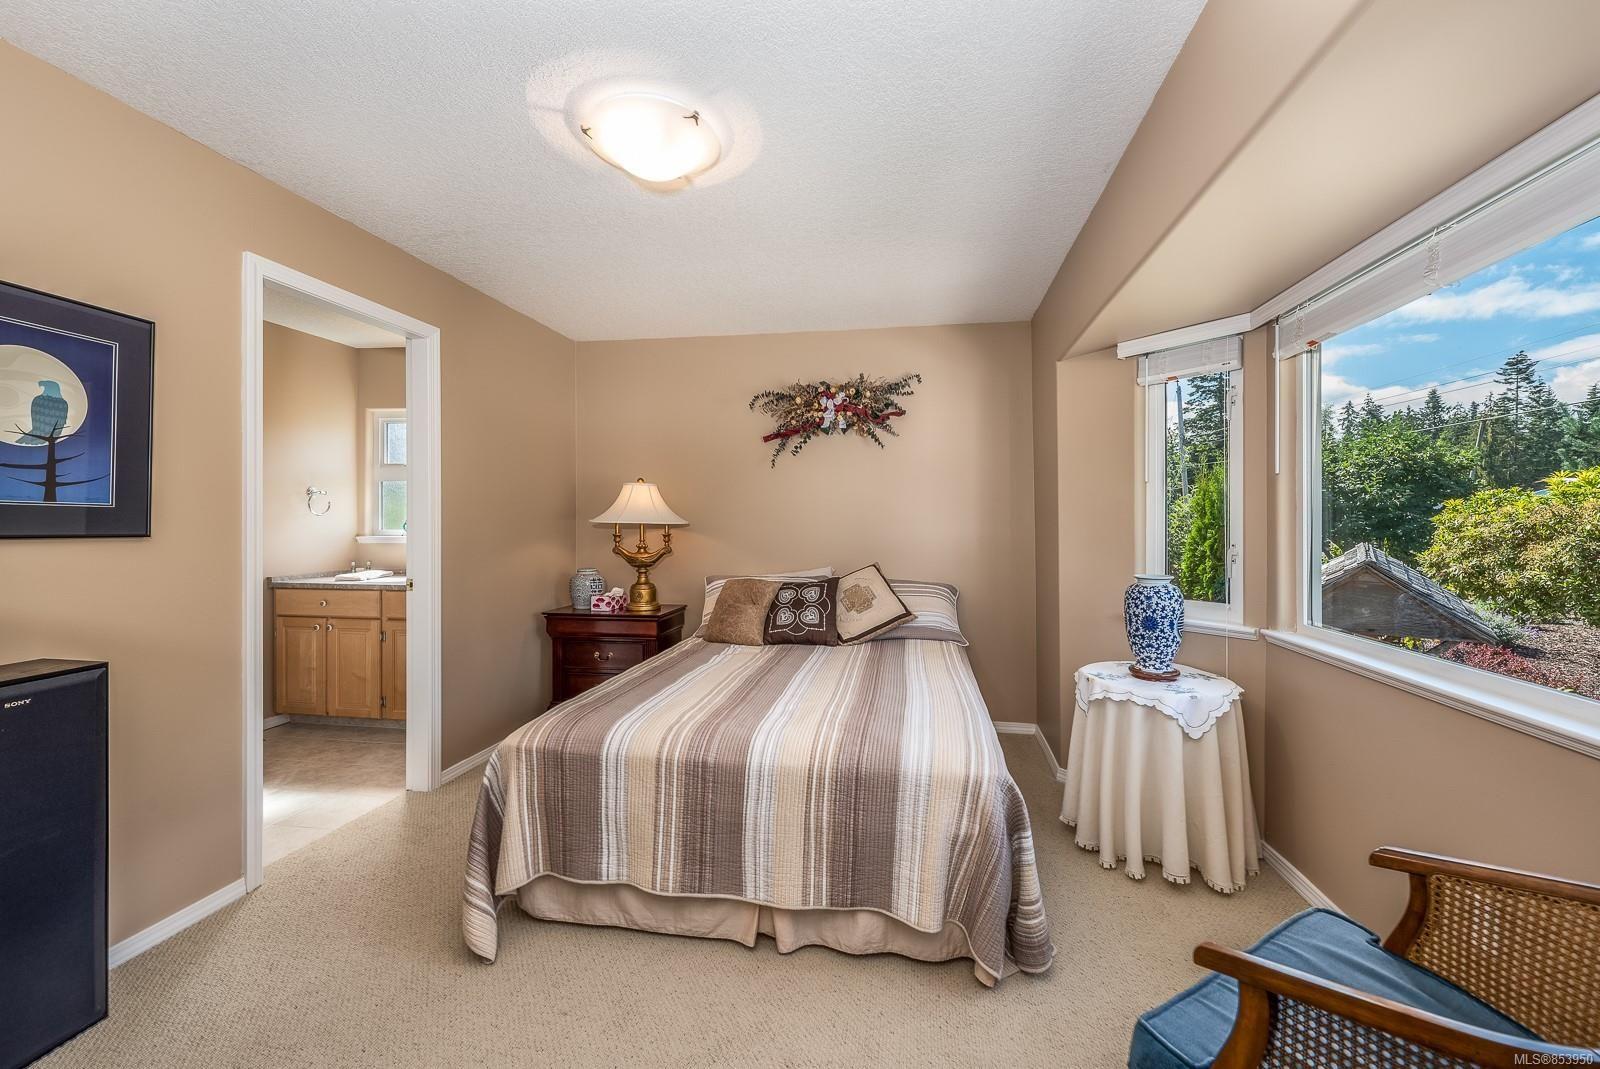 Photo 22: Photos: 5880 GARVIN Rd in : CV Union Bay/Fanny Bay House for sale (Comox Valley)  : MLS®# 853950